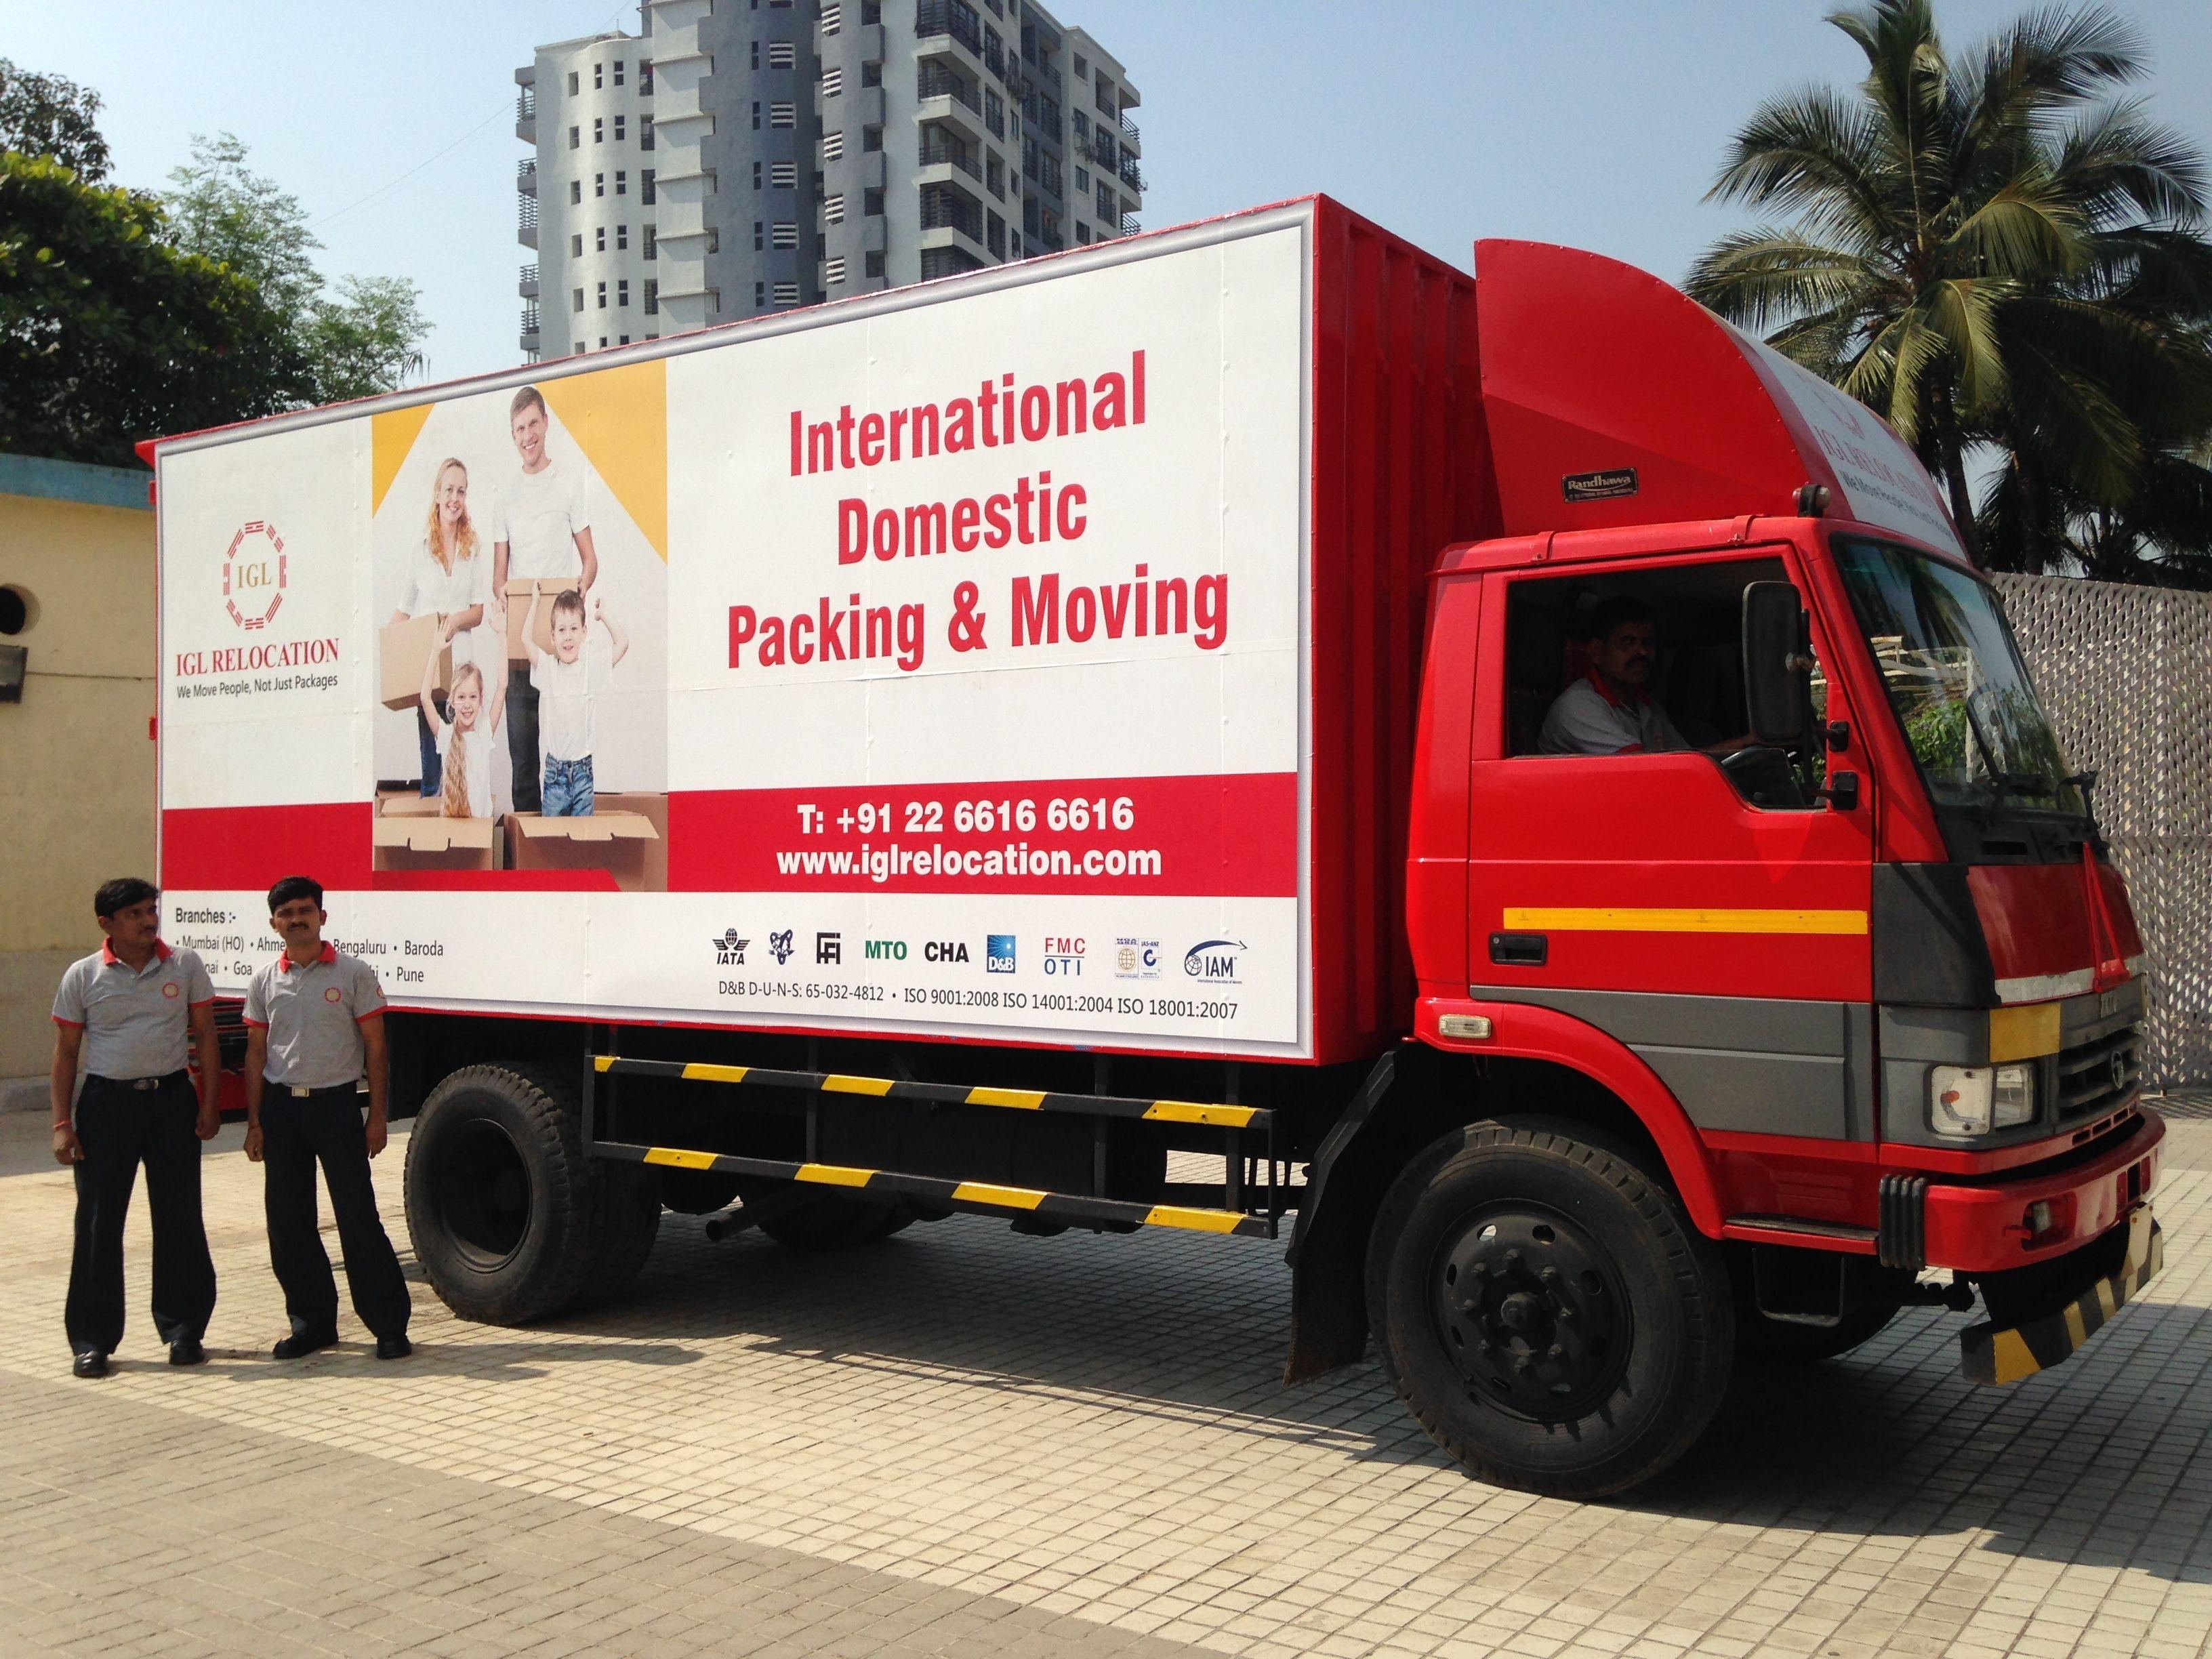 IGL Relocation Vehicle